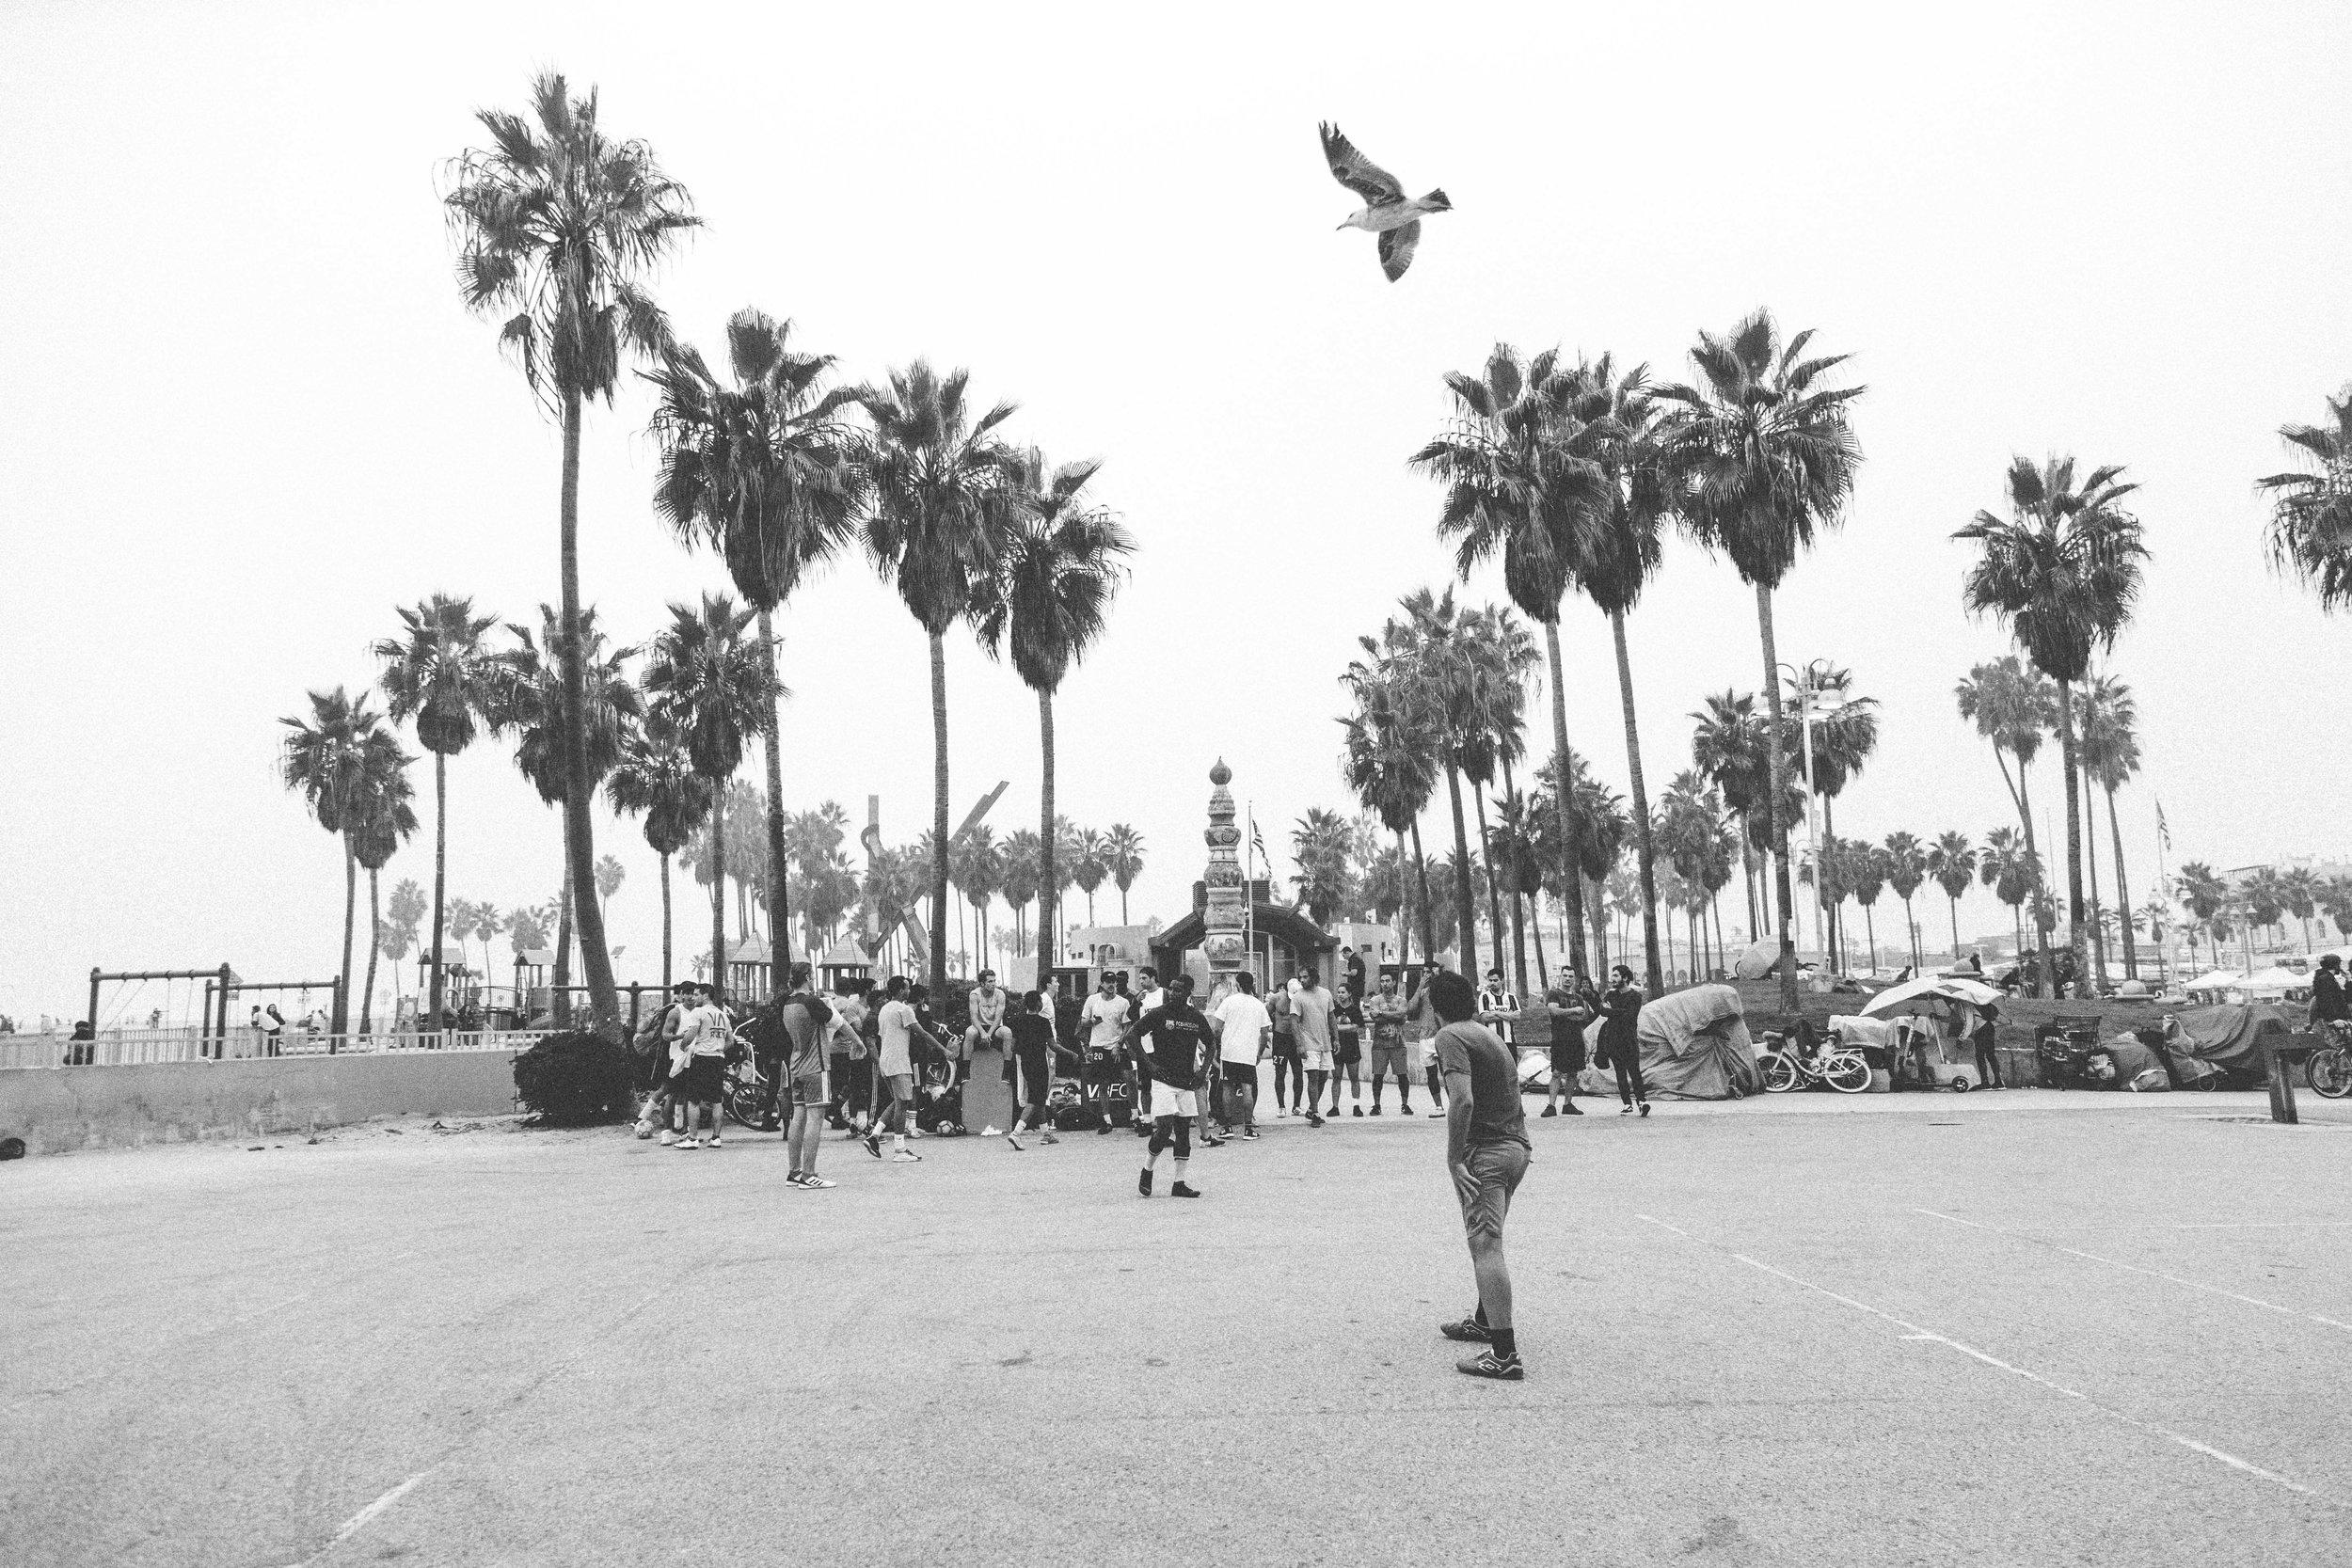 11-04-18-Venice Beach, VBFC Black and White-2546.jpg